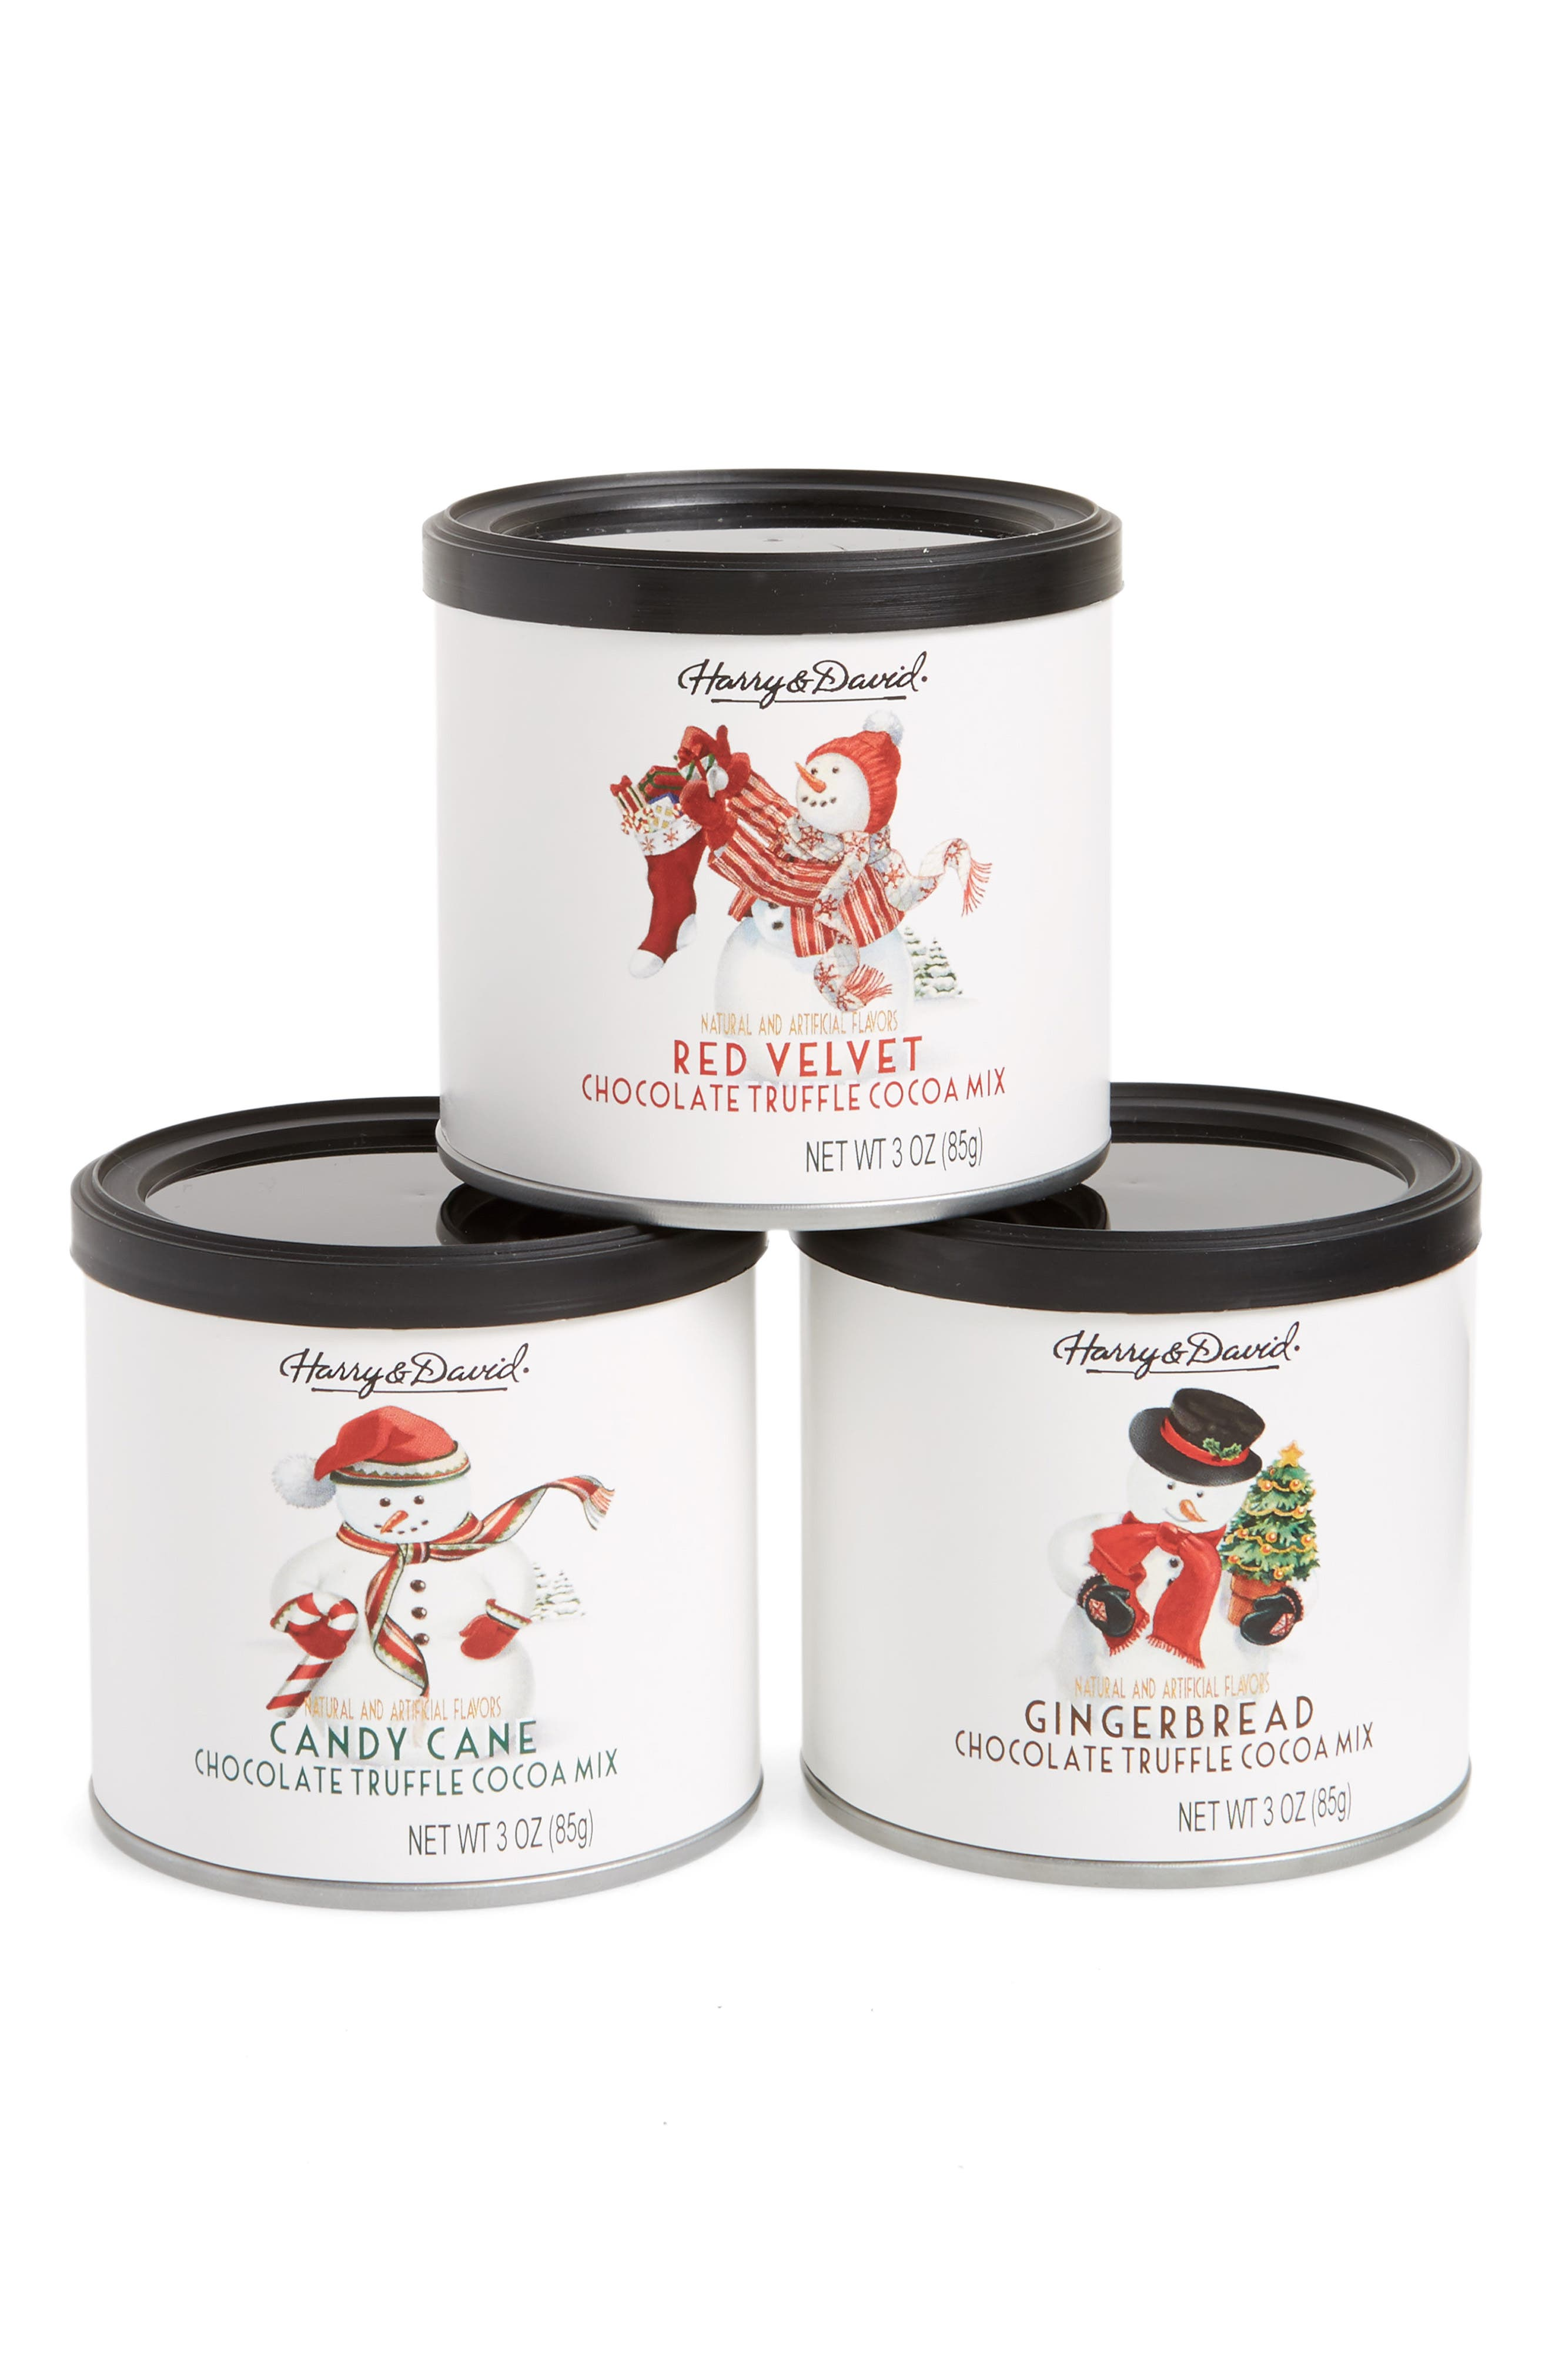 Harry & David Holiday Cocoa Mix Gift Set,                             Main thumbnail 1, color,                             Red